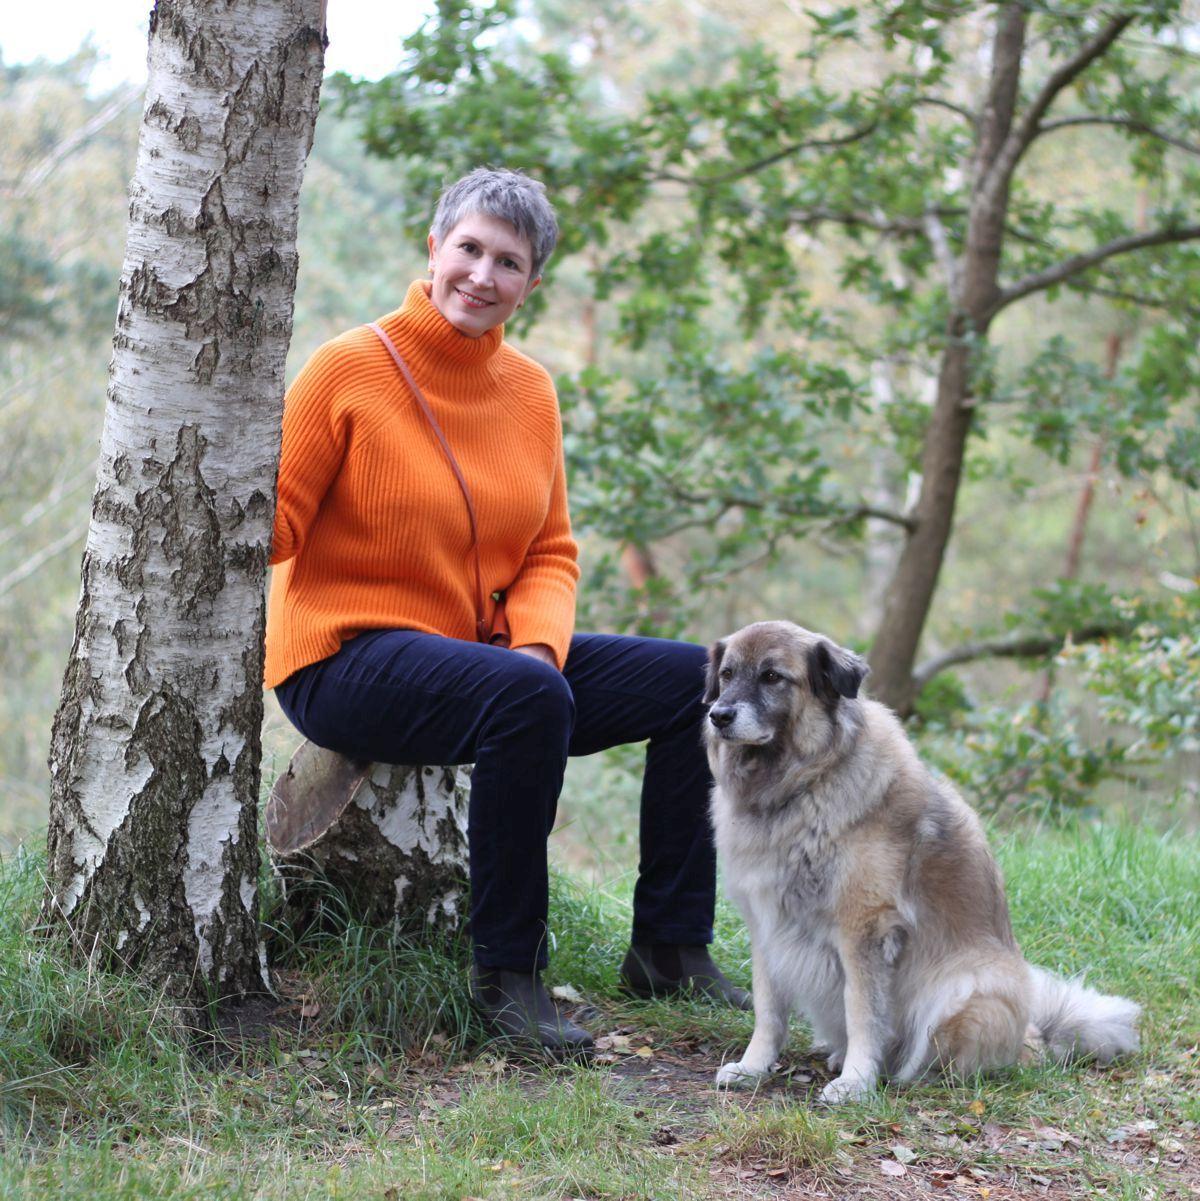 Ines Meyrose – Outfit 2021 – Rollkragenpullover / Turtleneck orange, Cordhose blau - Ü50 Bloggerin mit Hund Paul